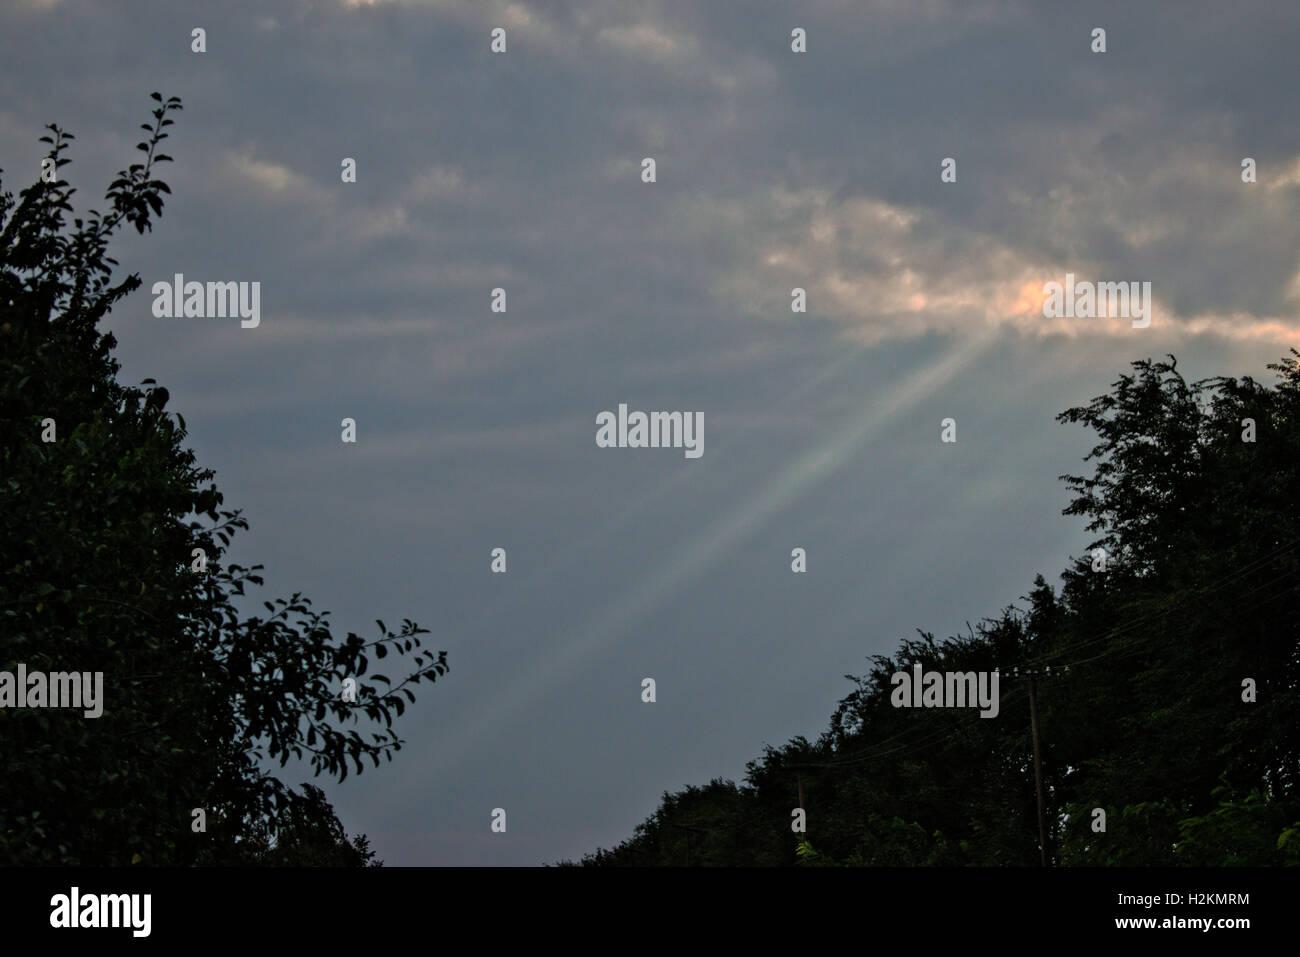 Bright rays of sun bursting through dark clouds - Stock Image